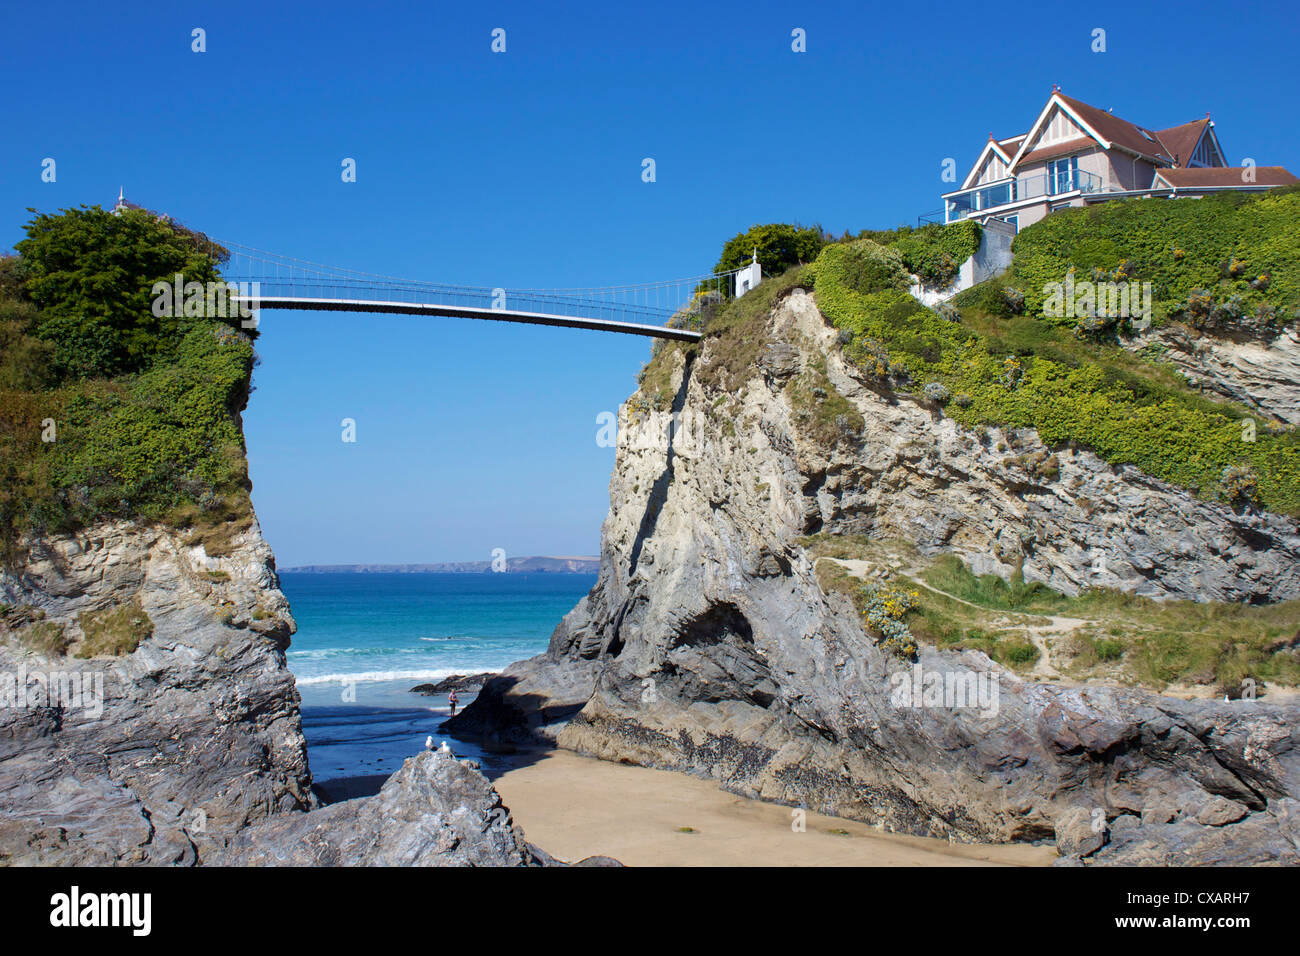 Towan Beach, Newquay, Cornwall, England, United Kingdom, Europe - Stock Image